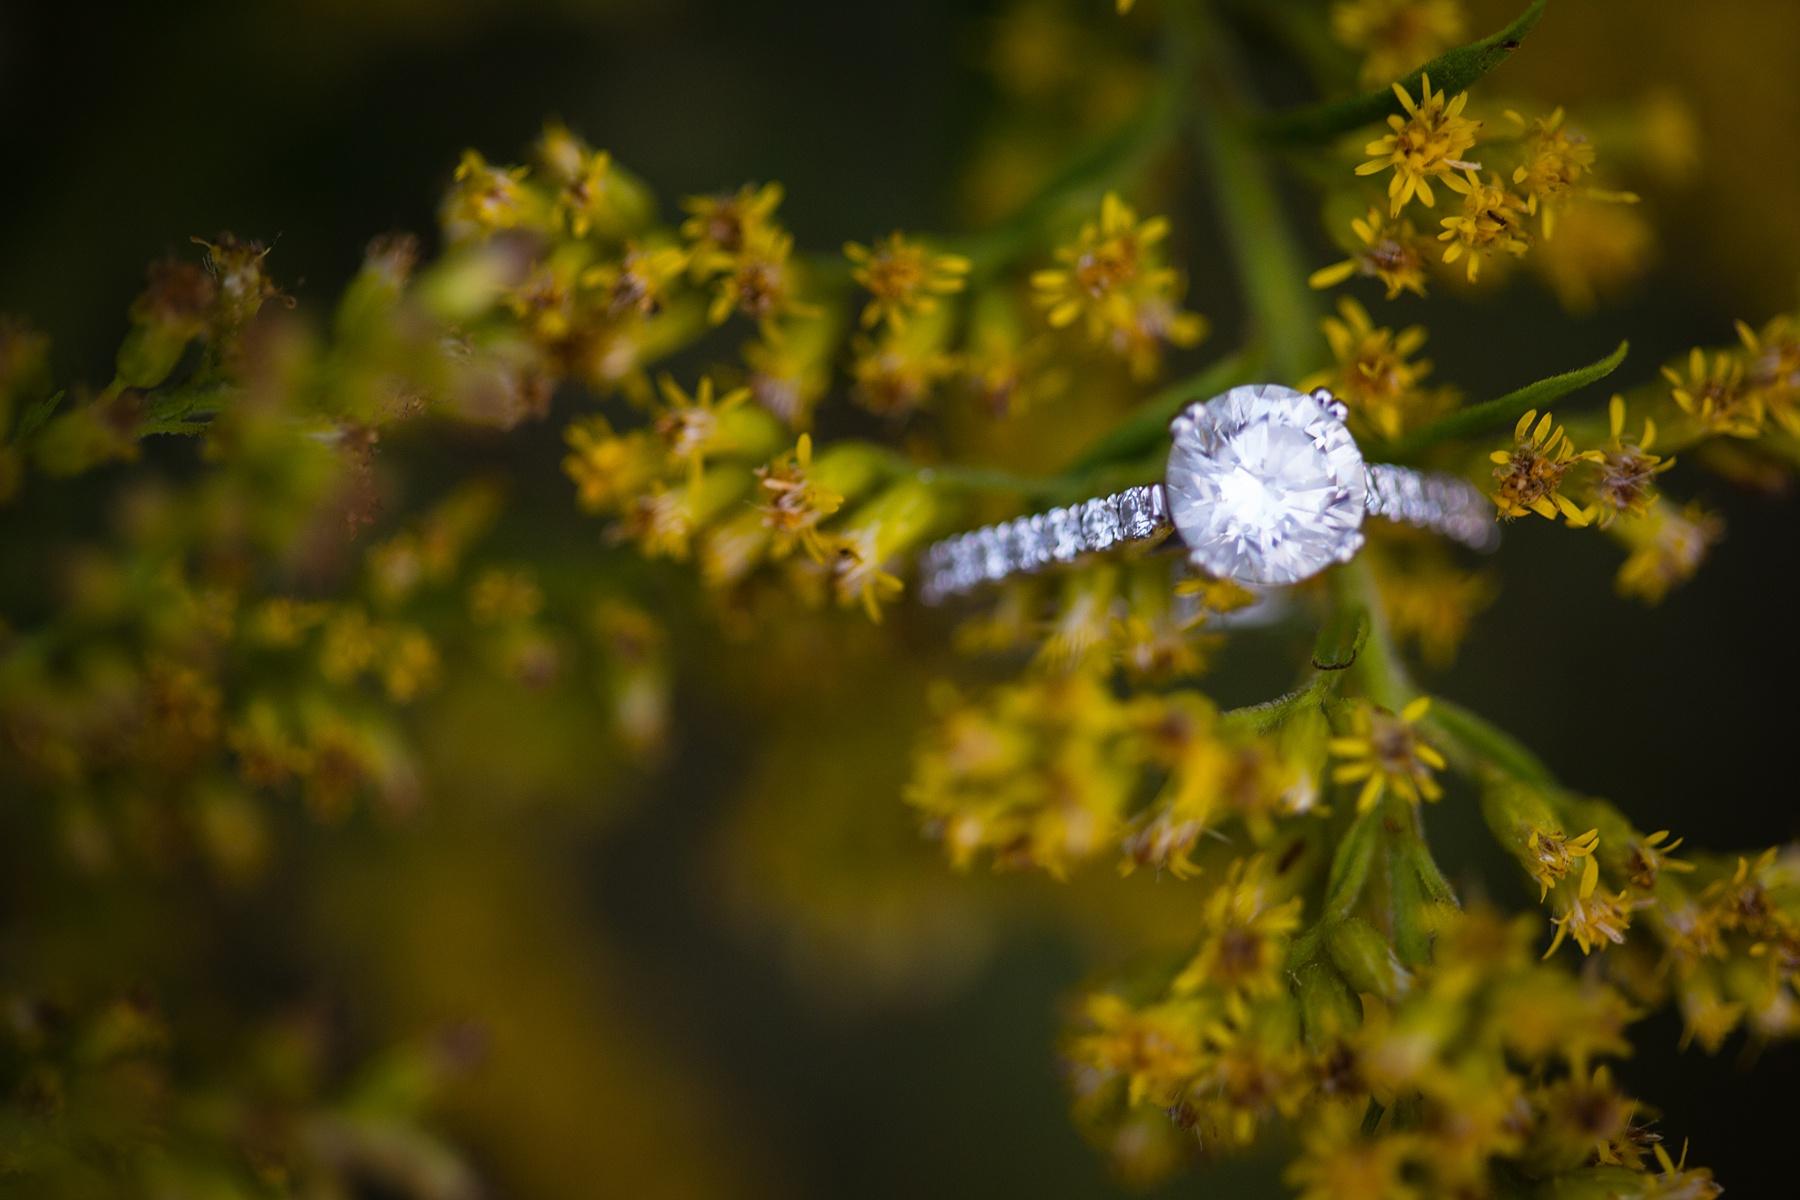 Brandon_Shafer_Photography_Megan_Nate_West_Michigan_Engagement_Photos_0020.jpg